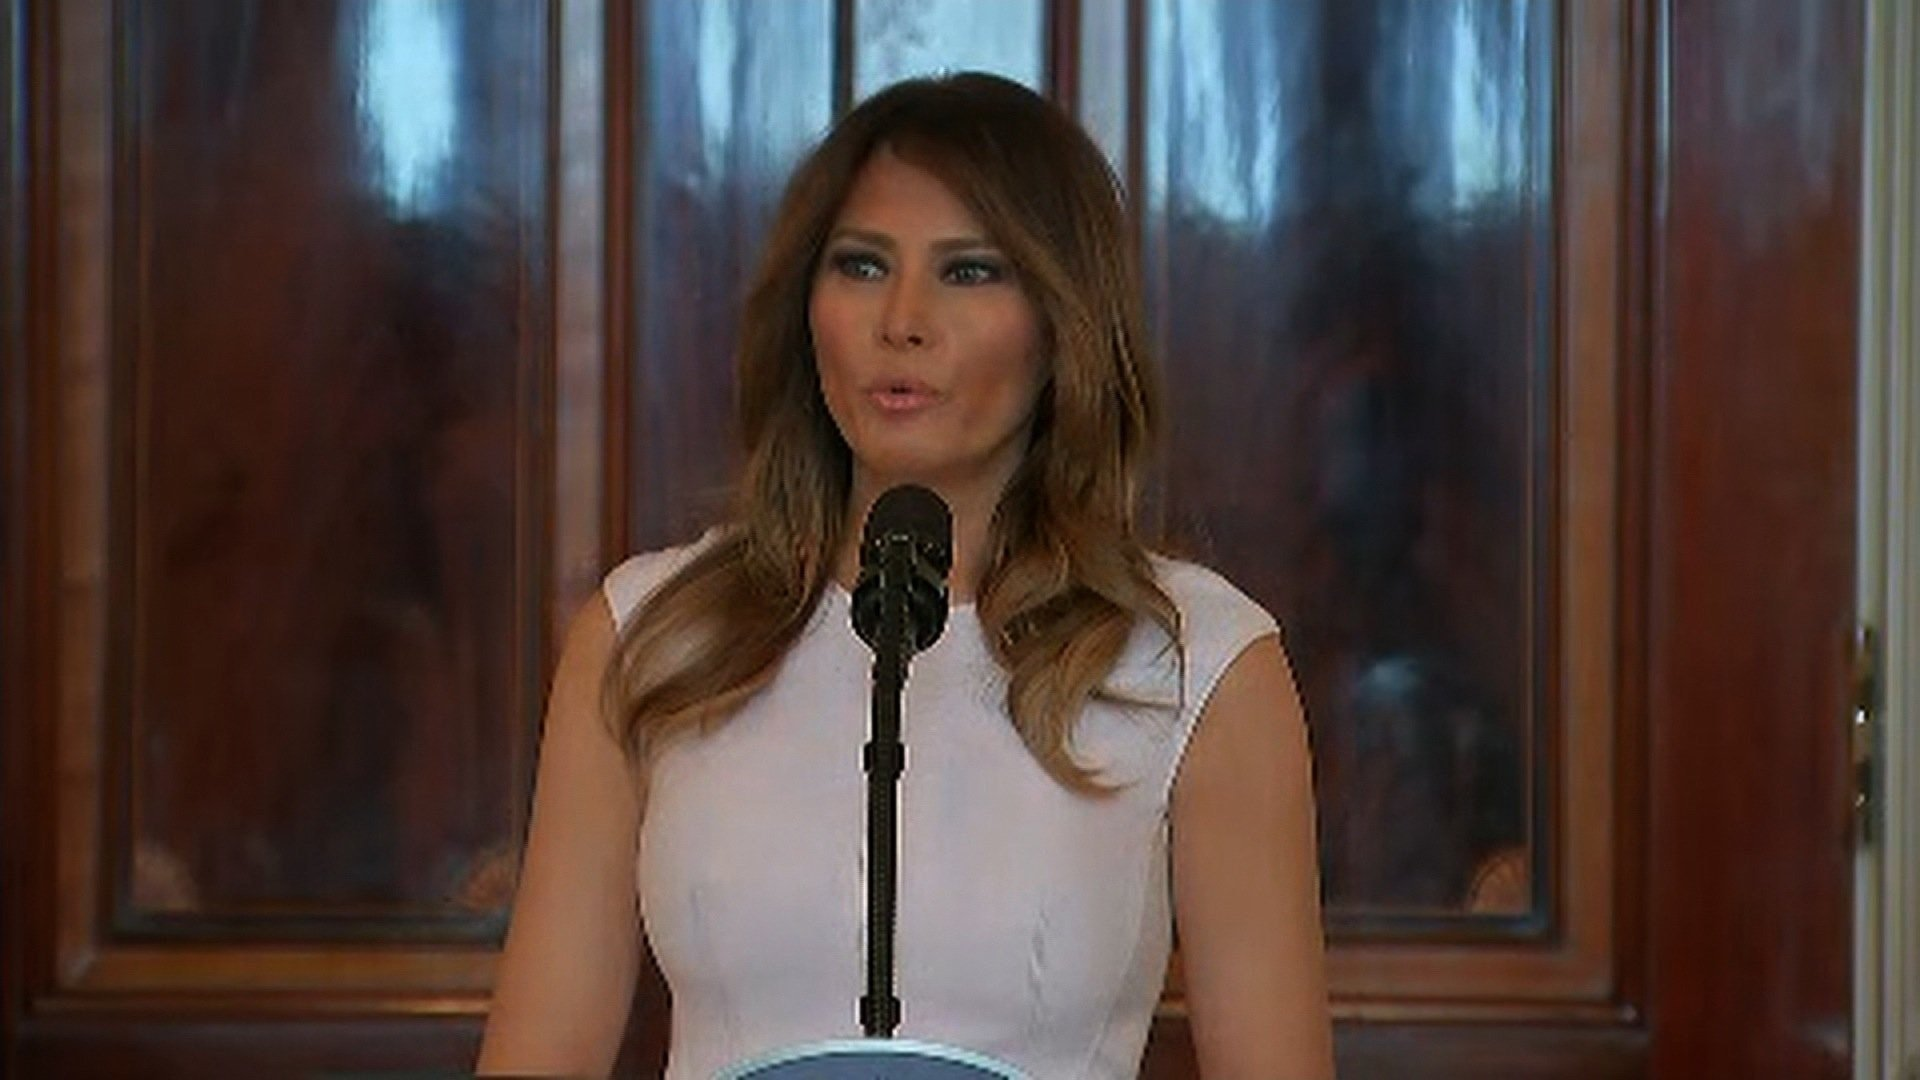 Melania Trump Delivers Powerful Speech In Response To School Shooting